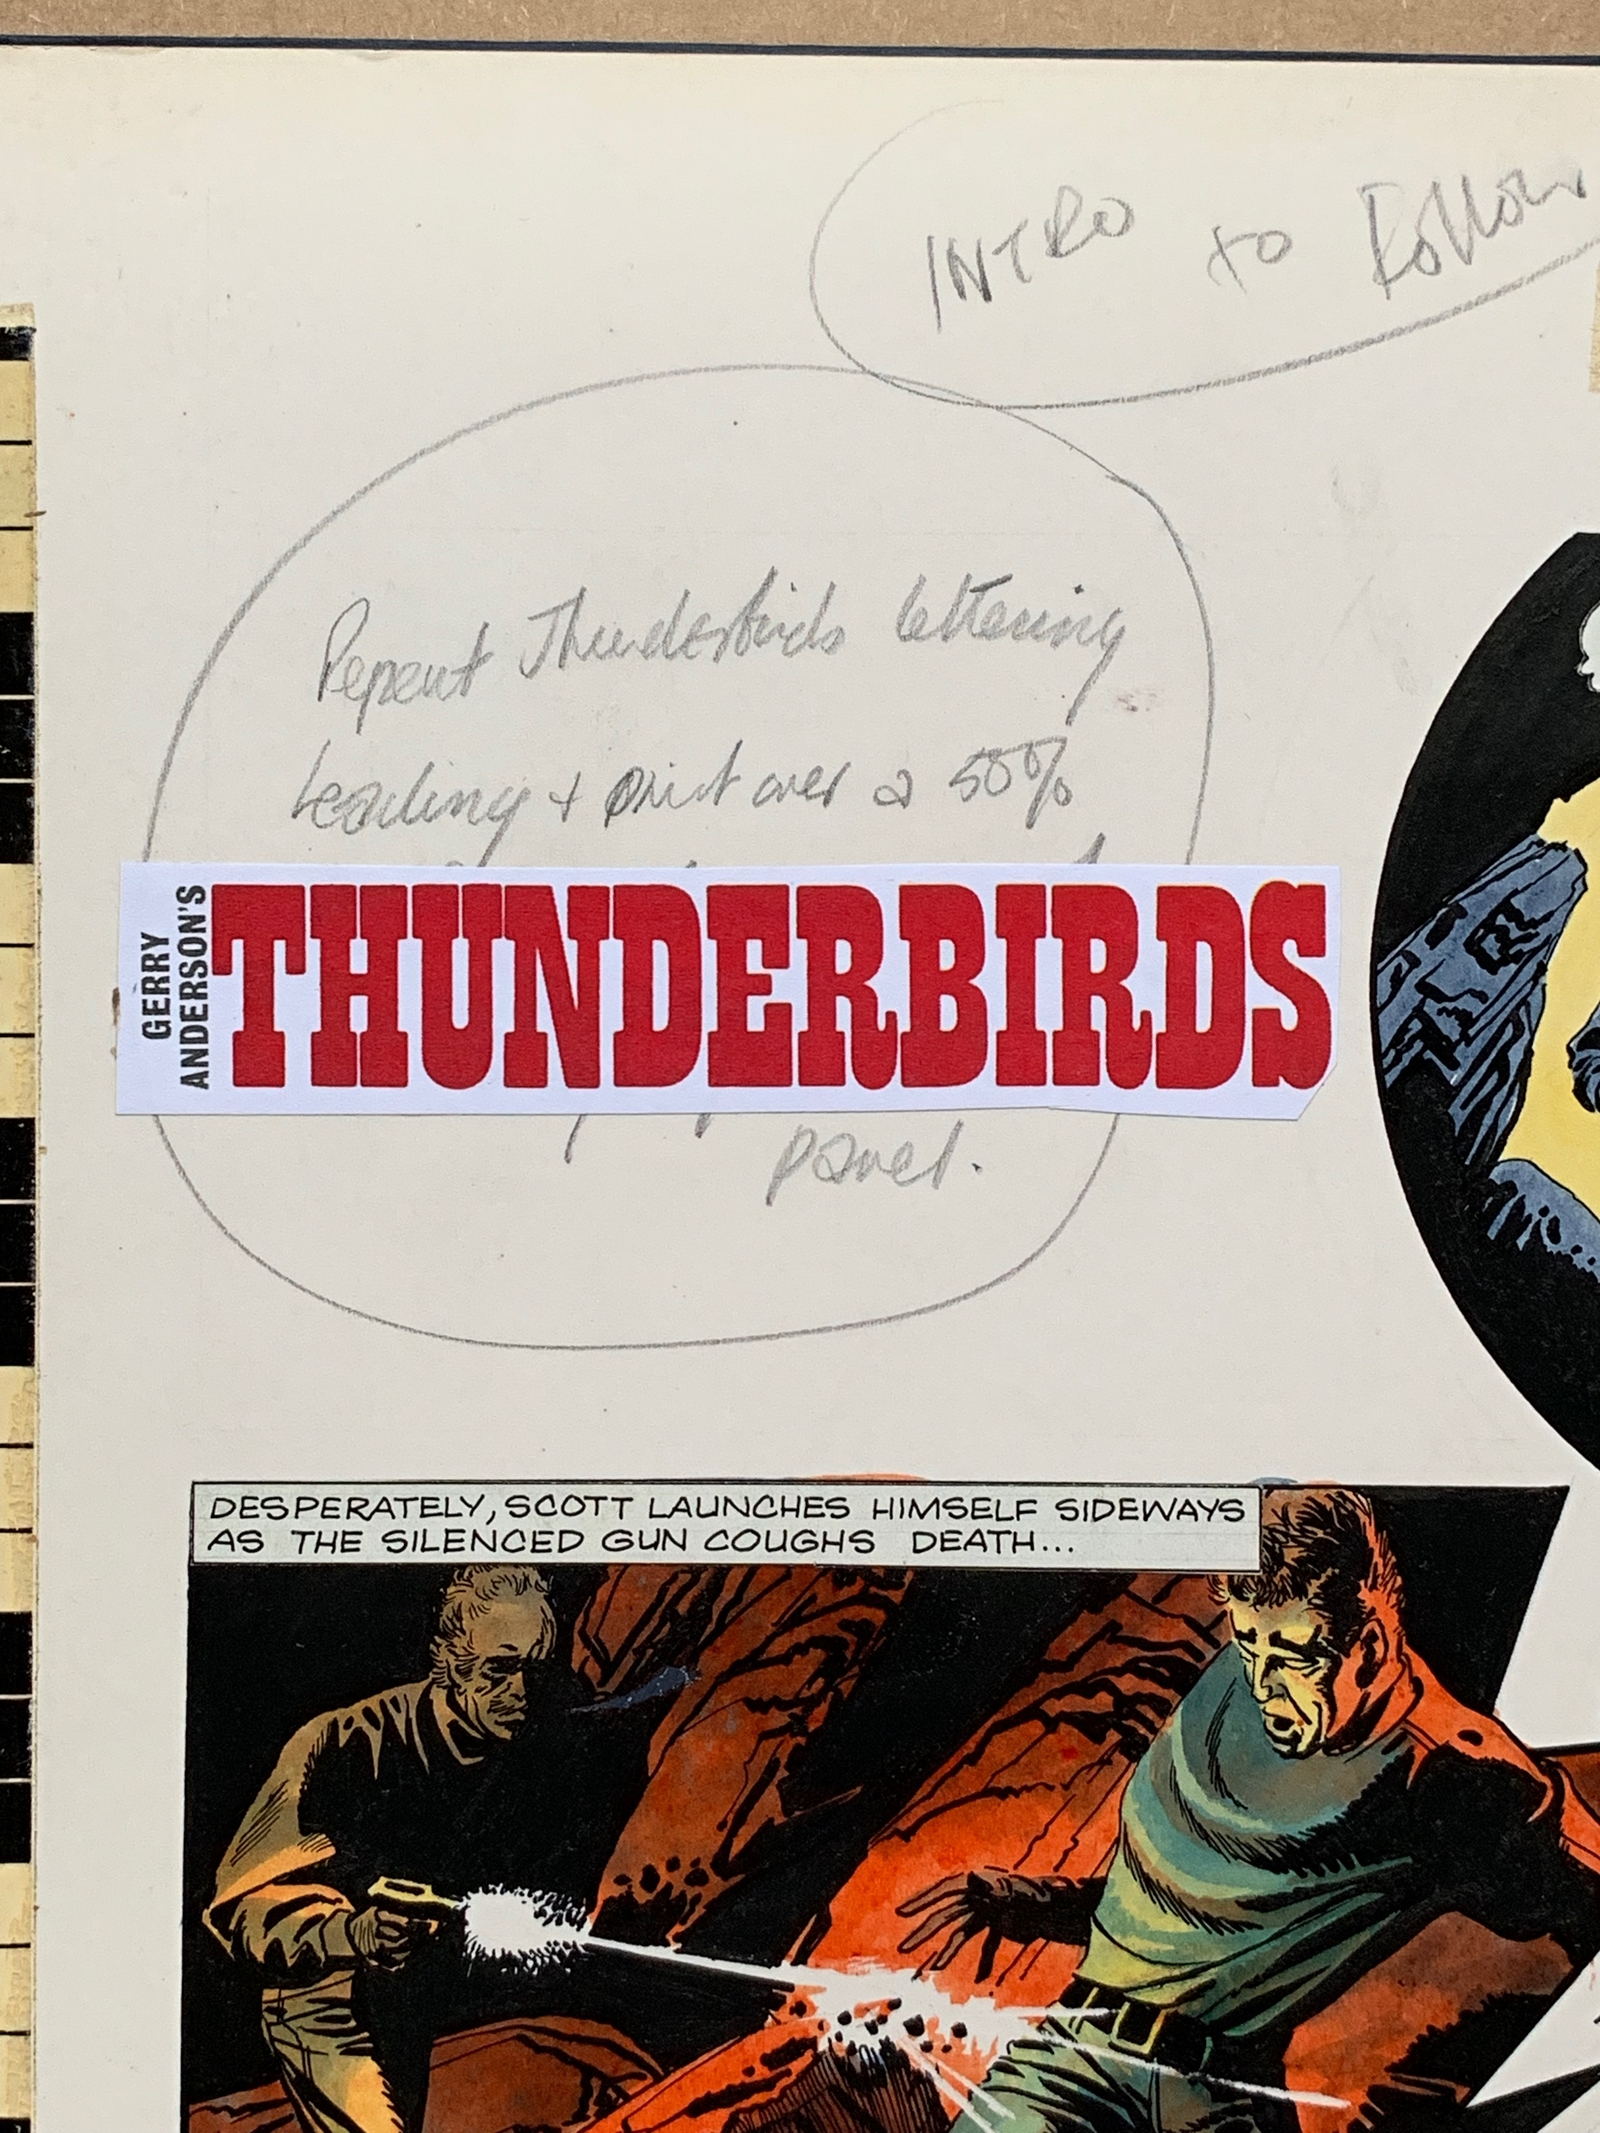 THUNDERBIRDS (1969) - ORIGINAL ARTWORK from TV21 C - Image 2 of 7